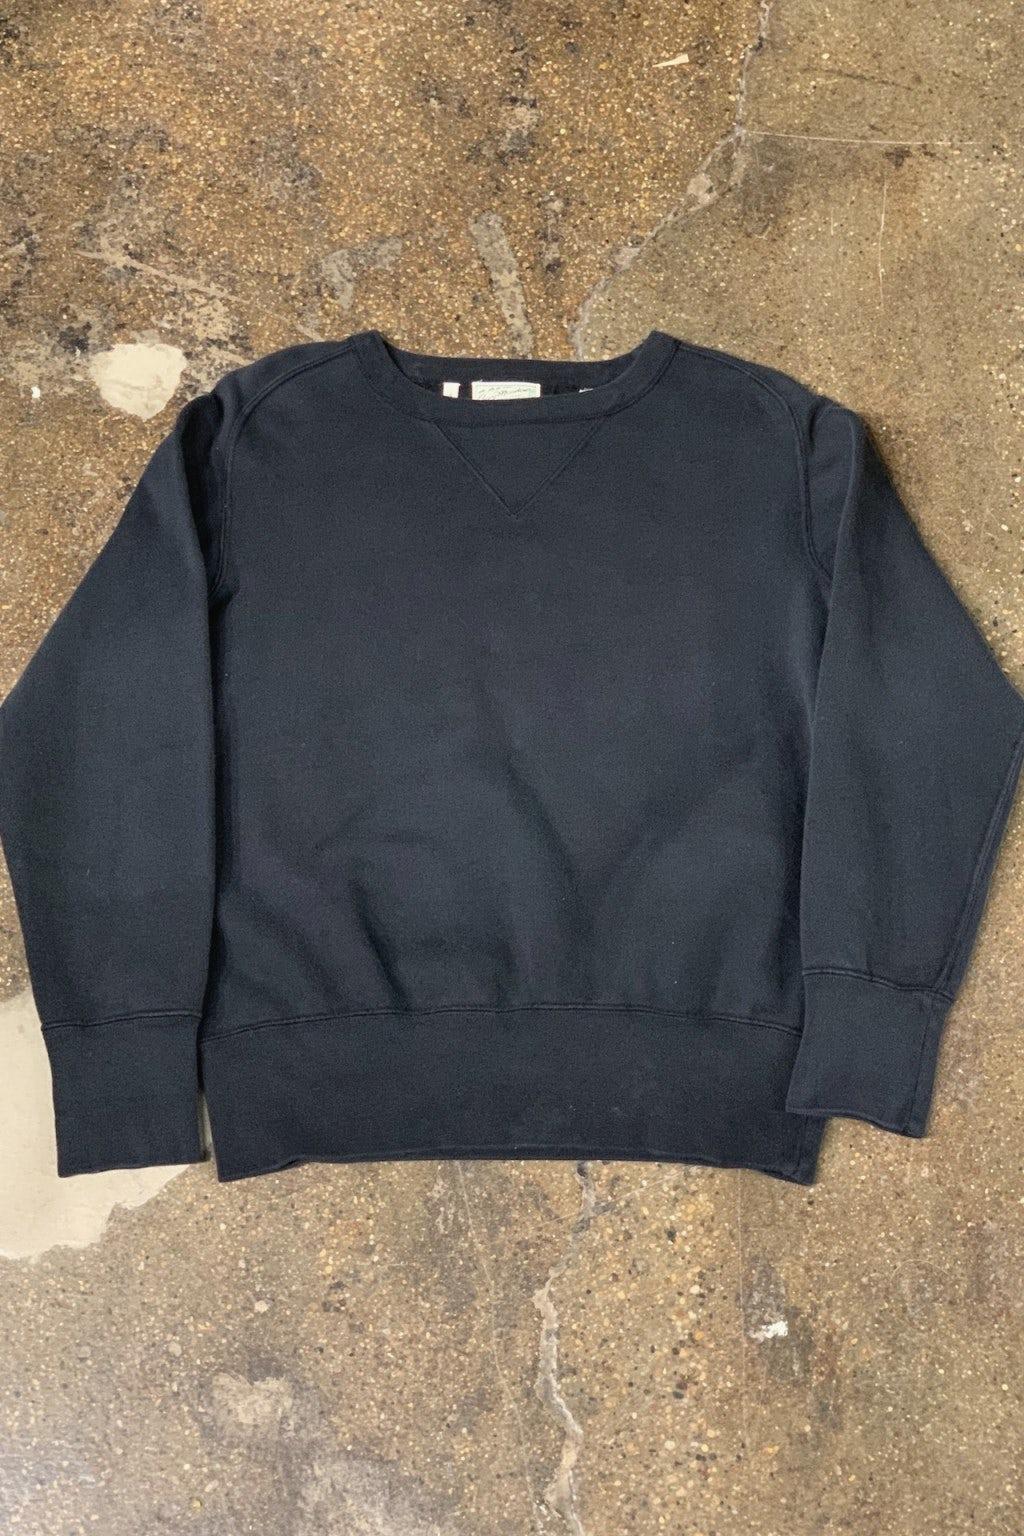 Levi's Bay Meadow Sweatshirt Black